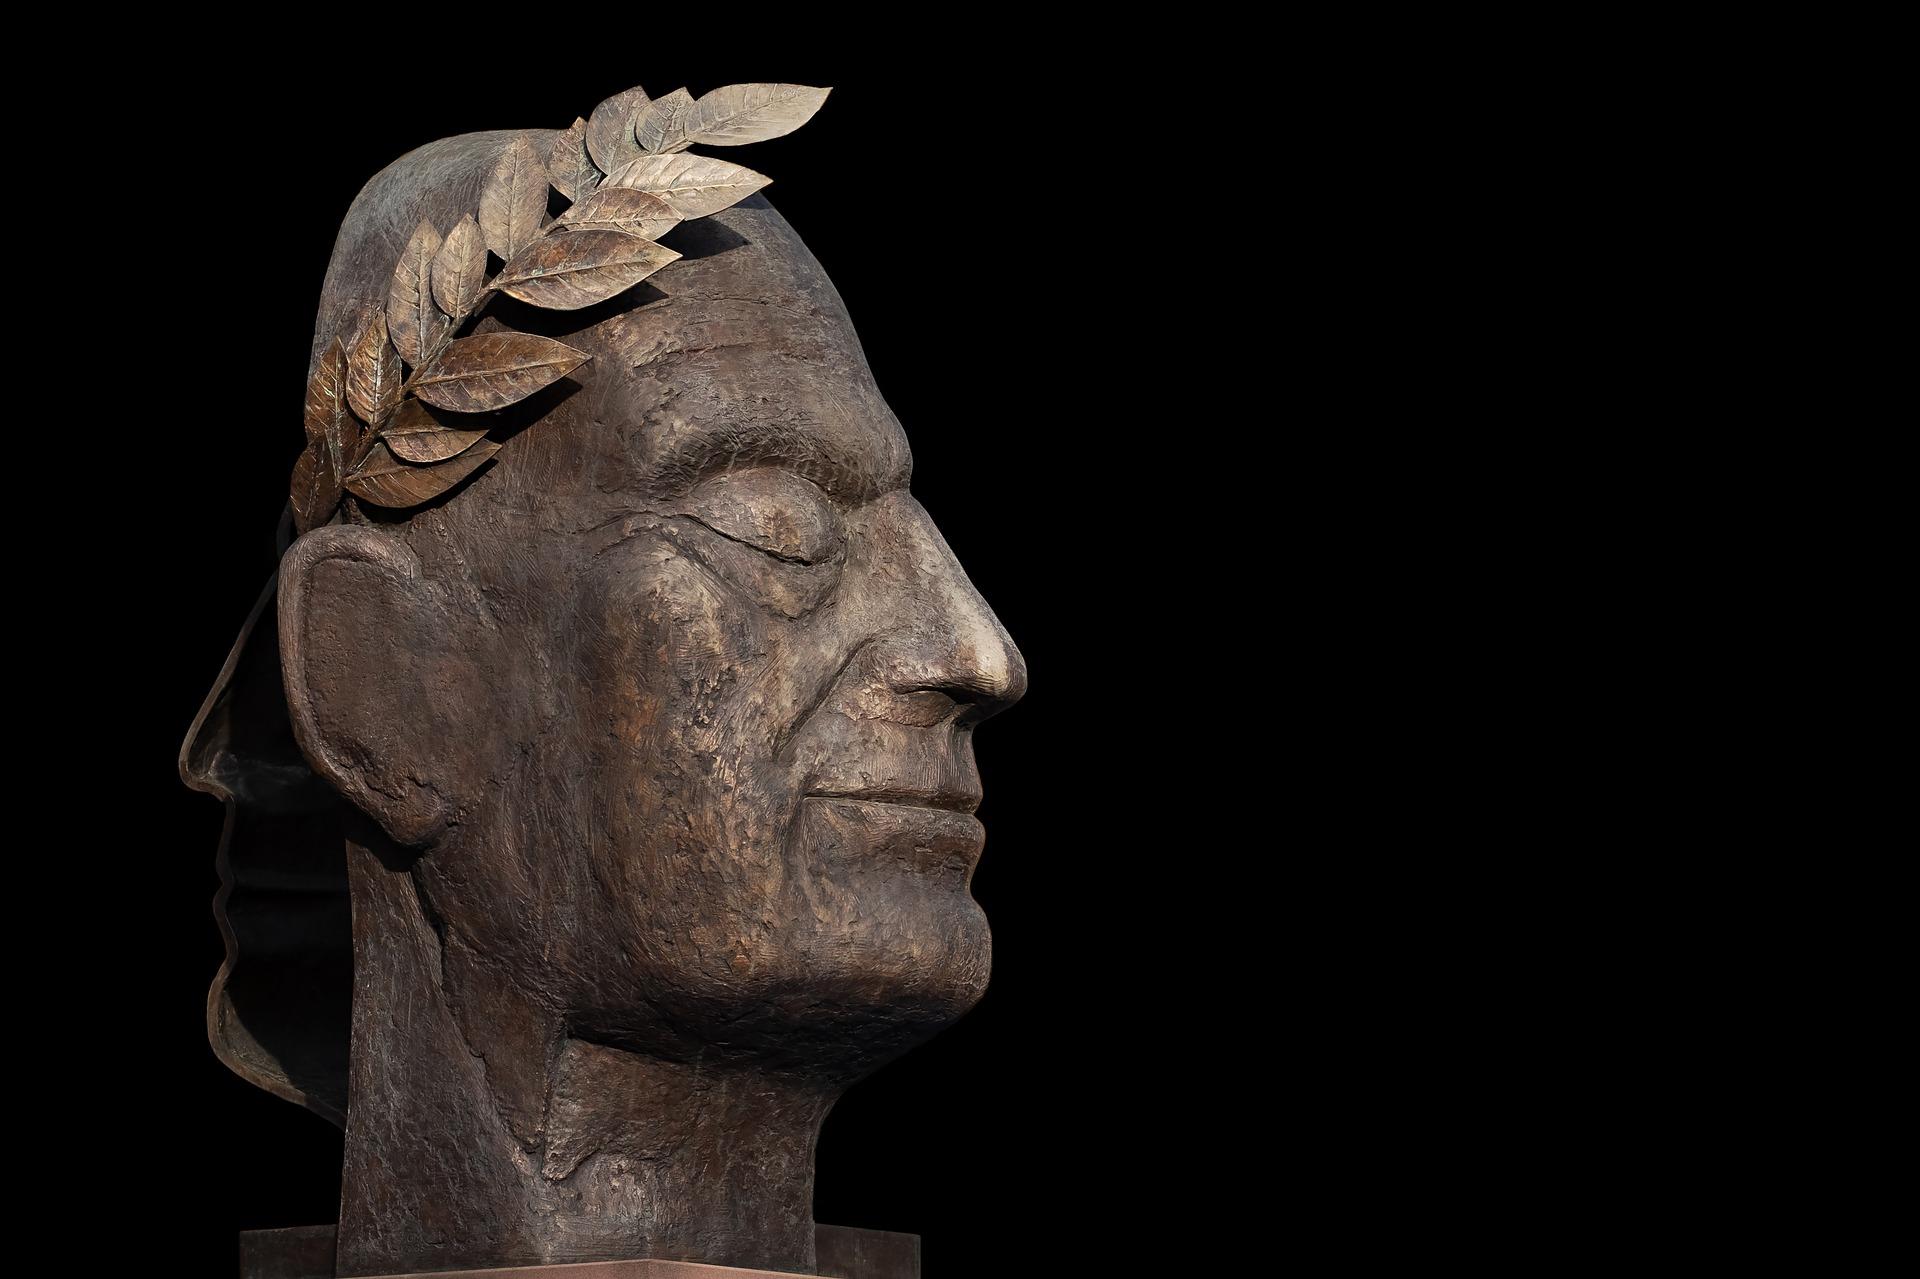 statue, sculpture, antiquity